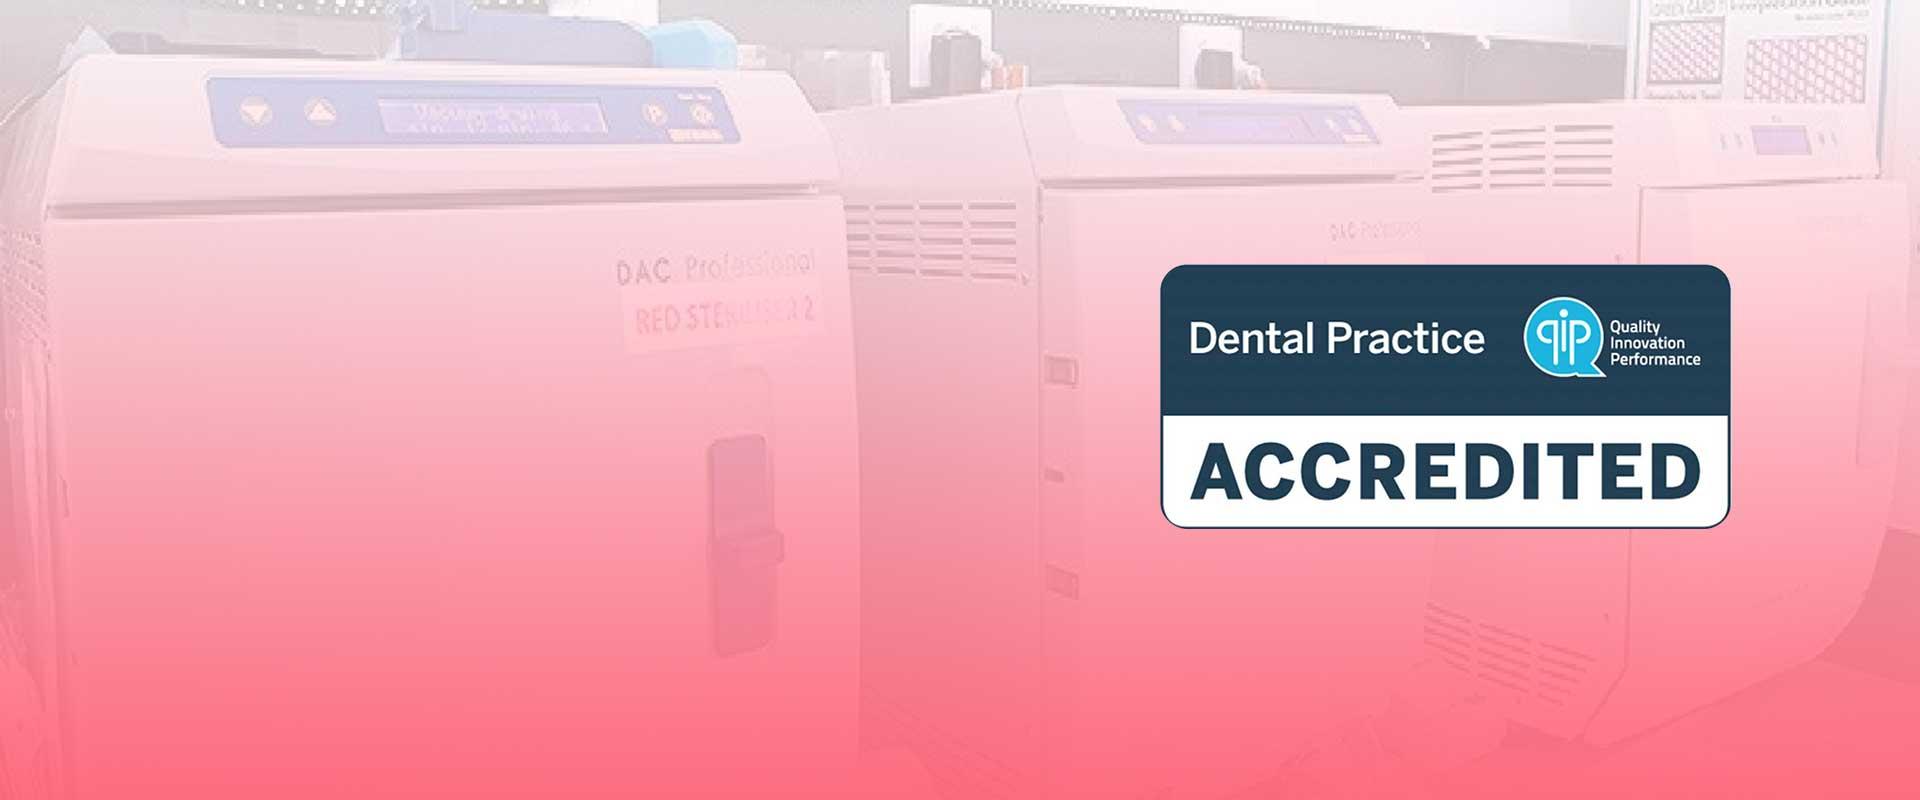 Hearts Dental in Blackburn is QIP accredited